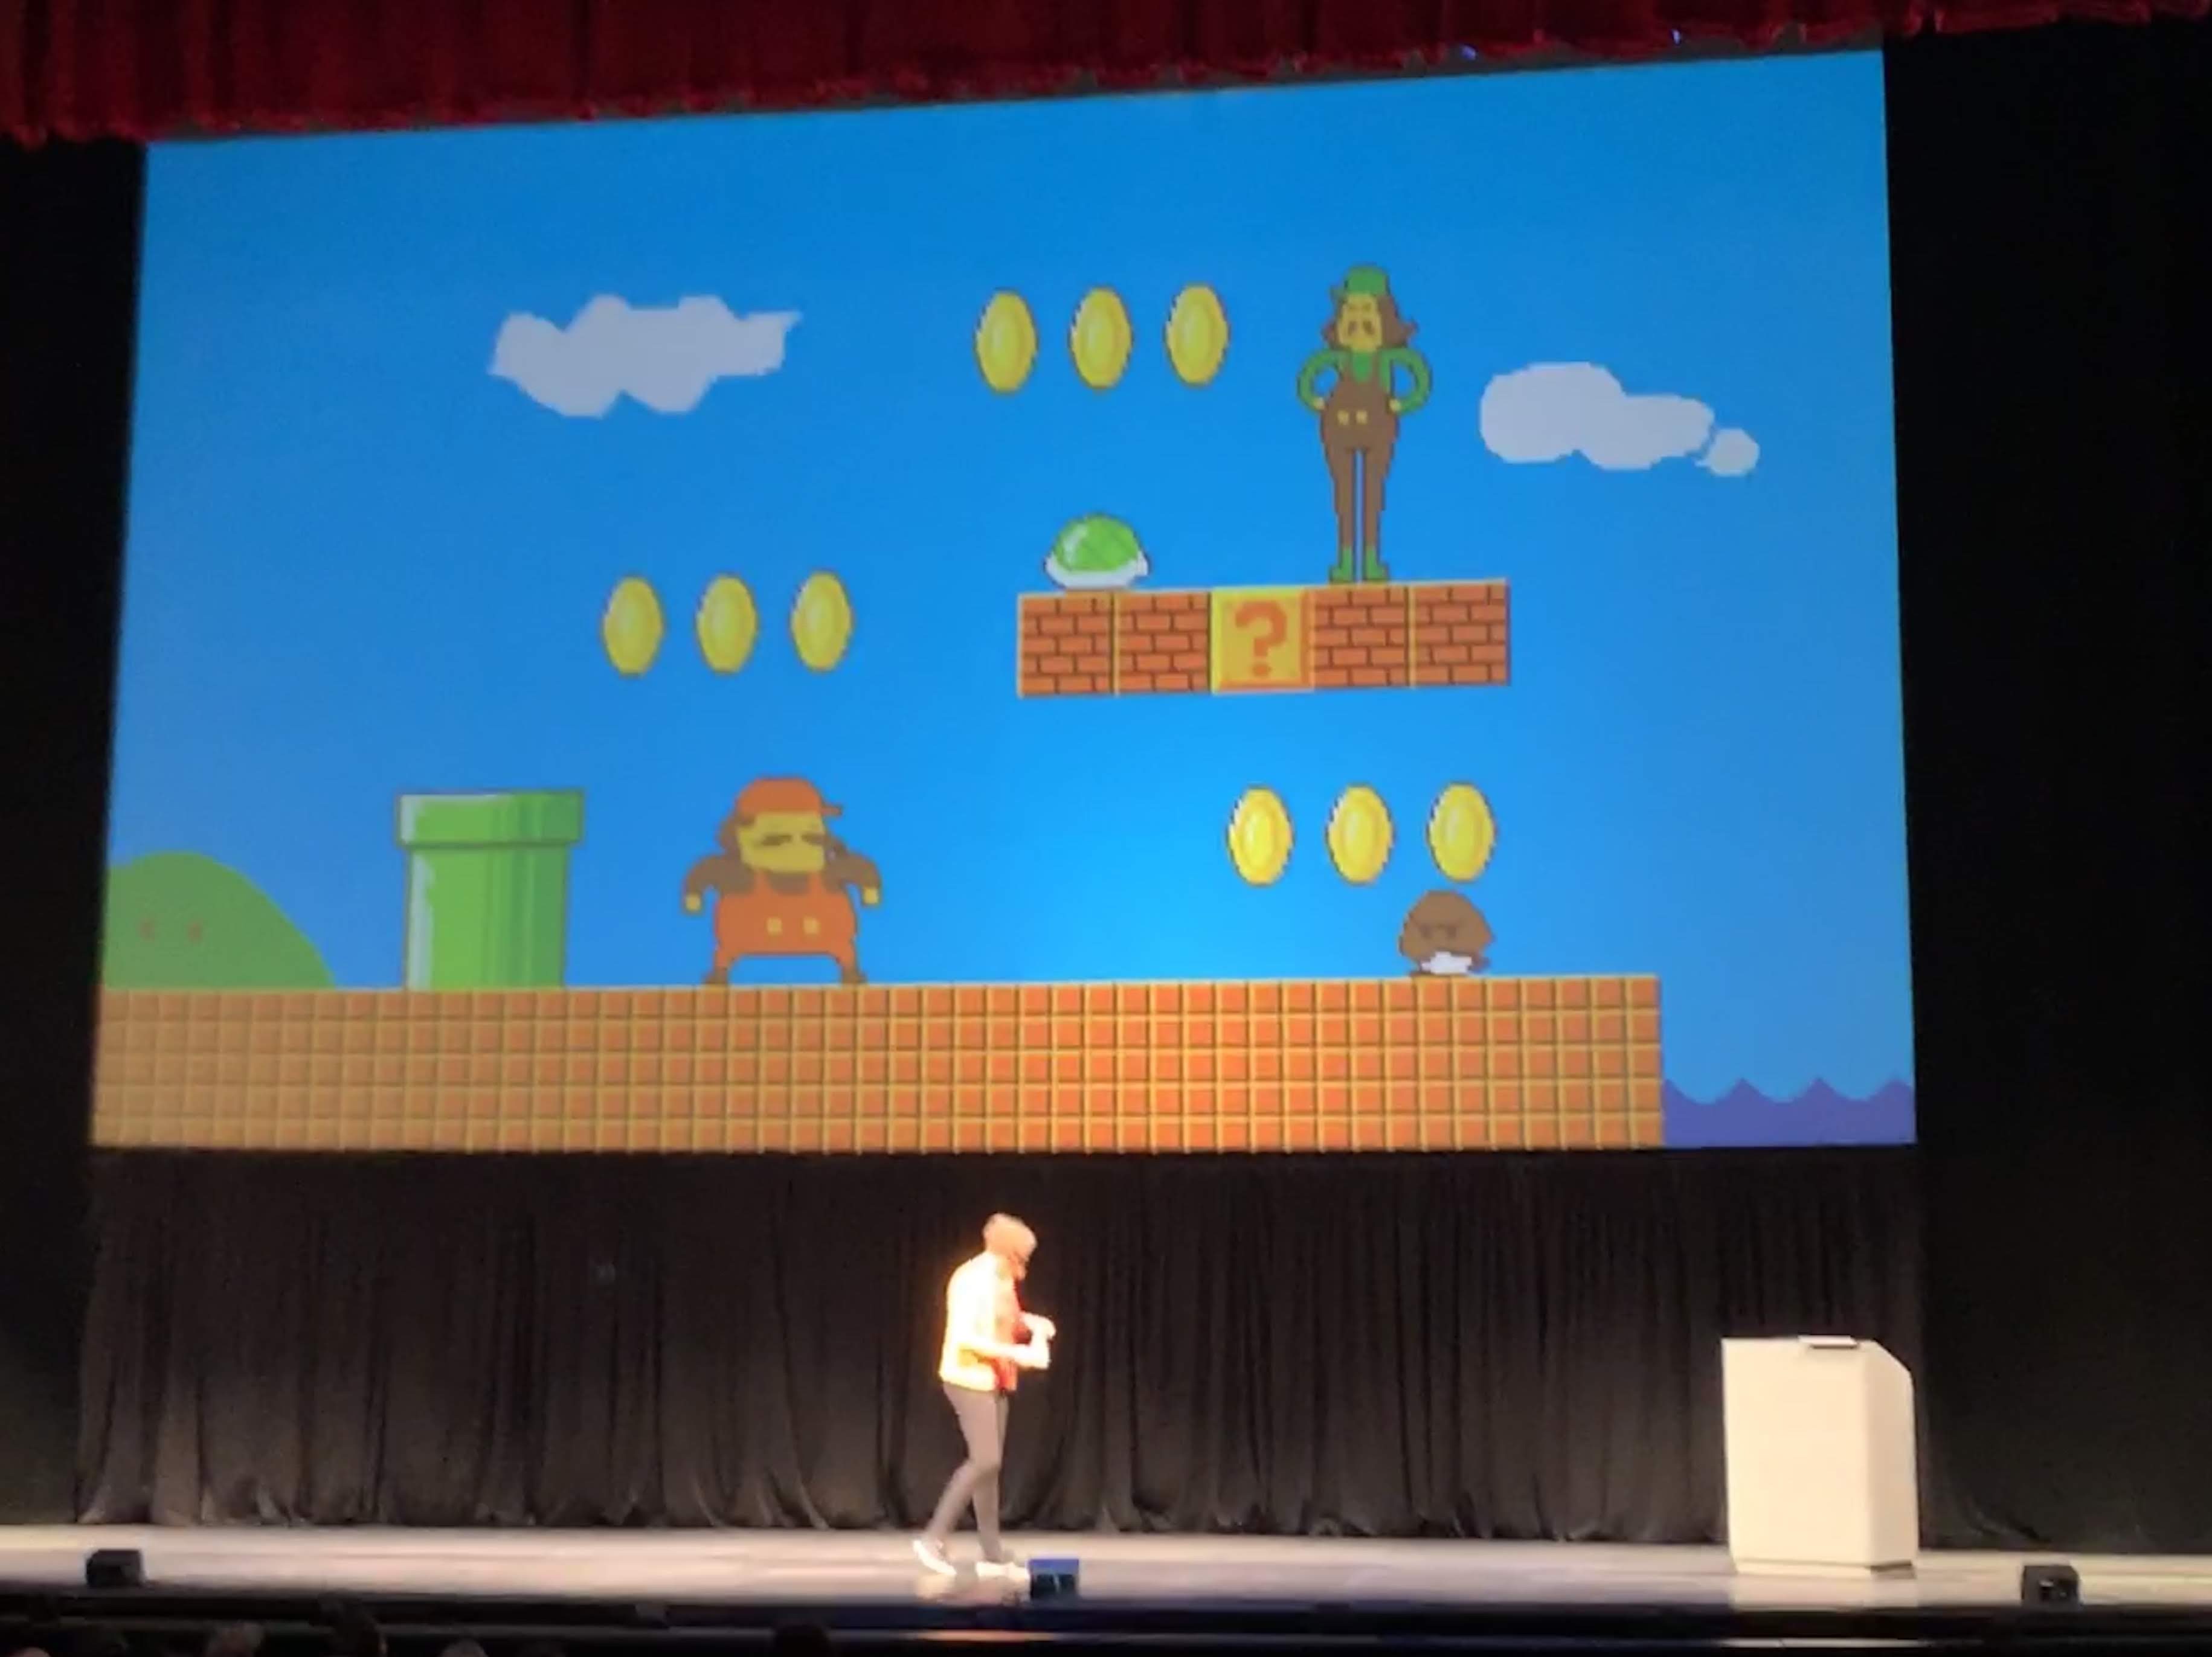 Ayla Myes presenting Mario Brothers like image she made